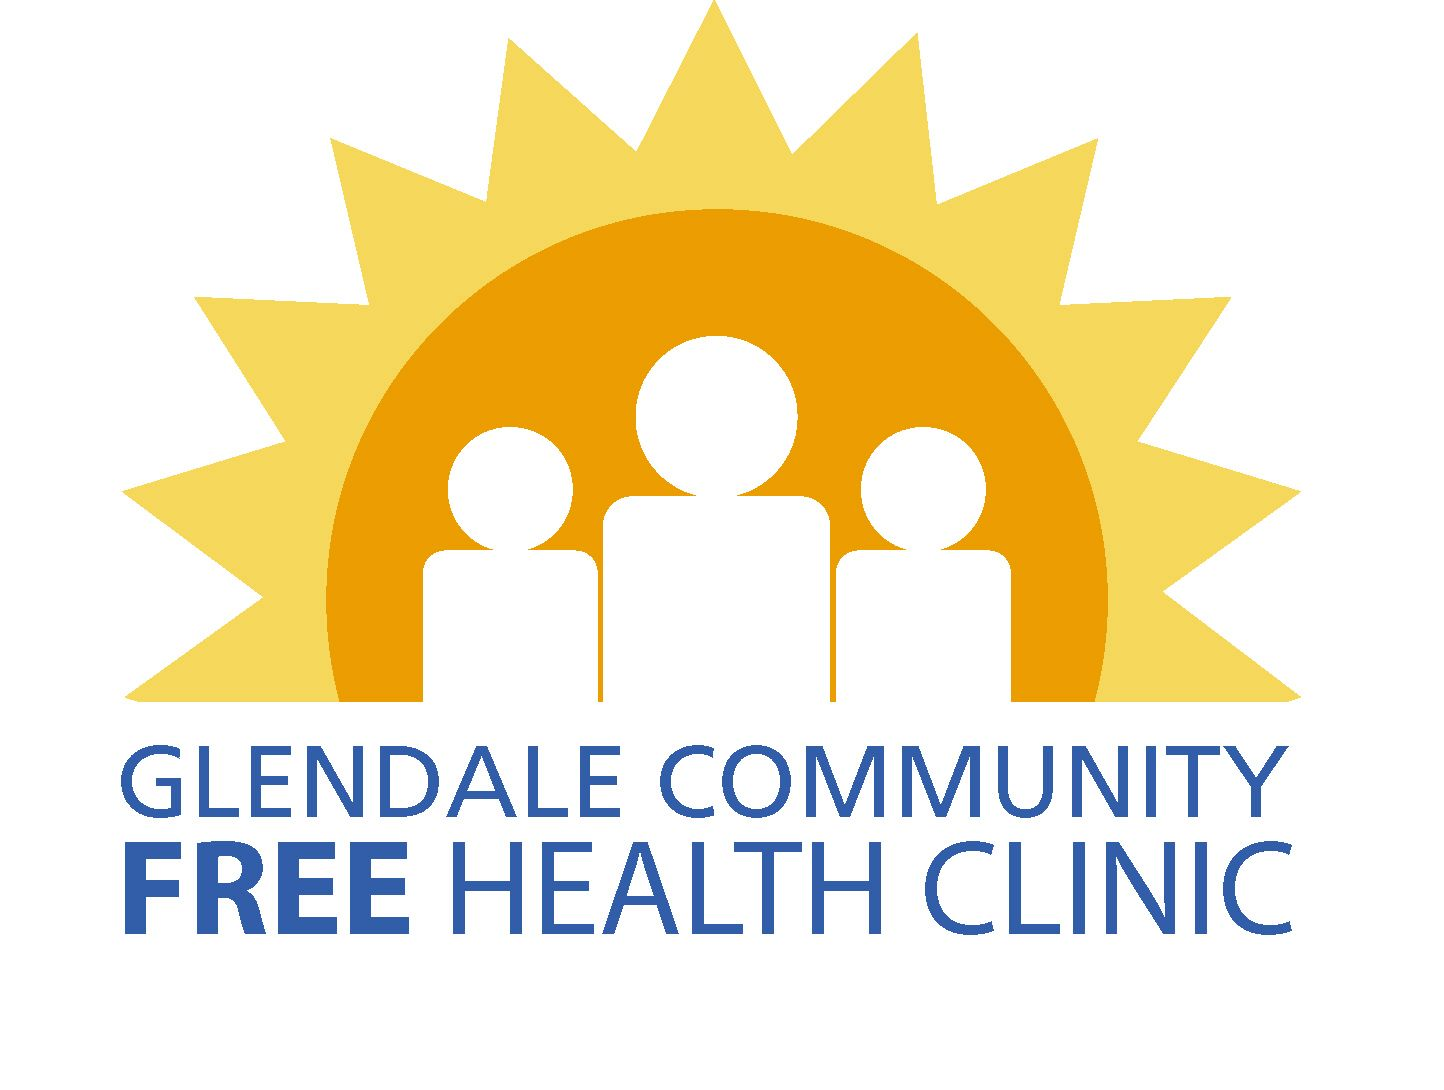 Glendale Community Free Health Clinic